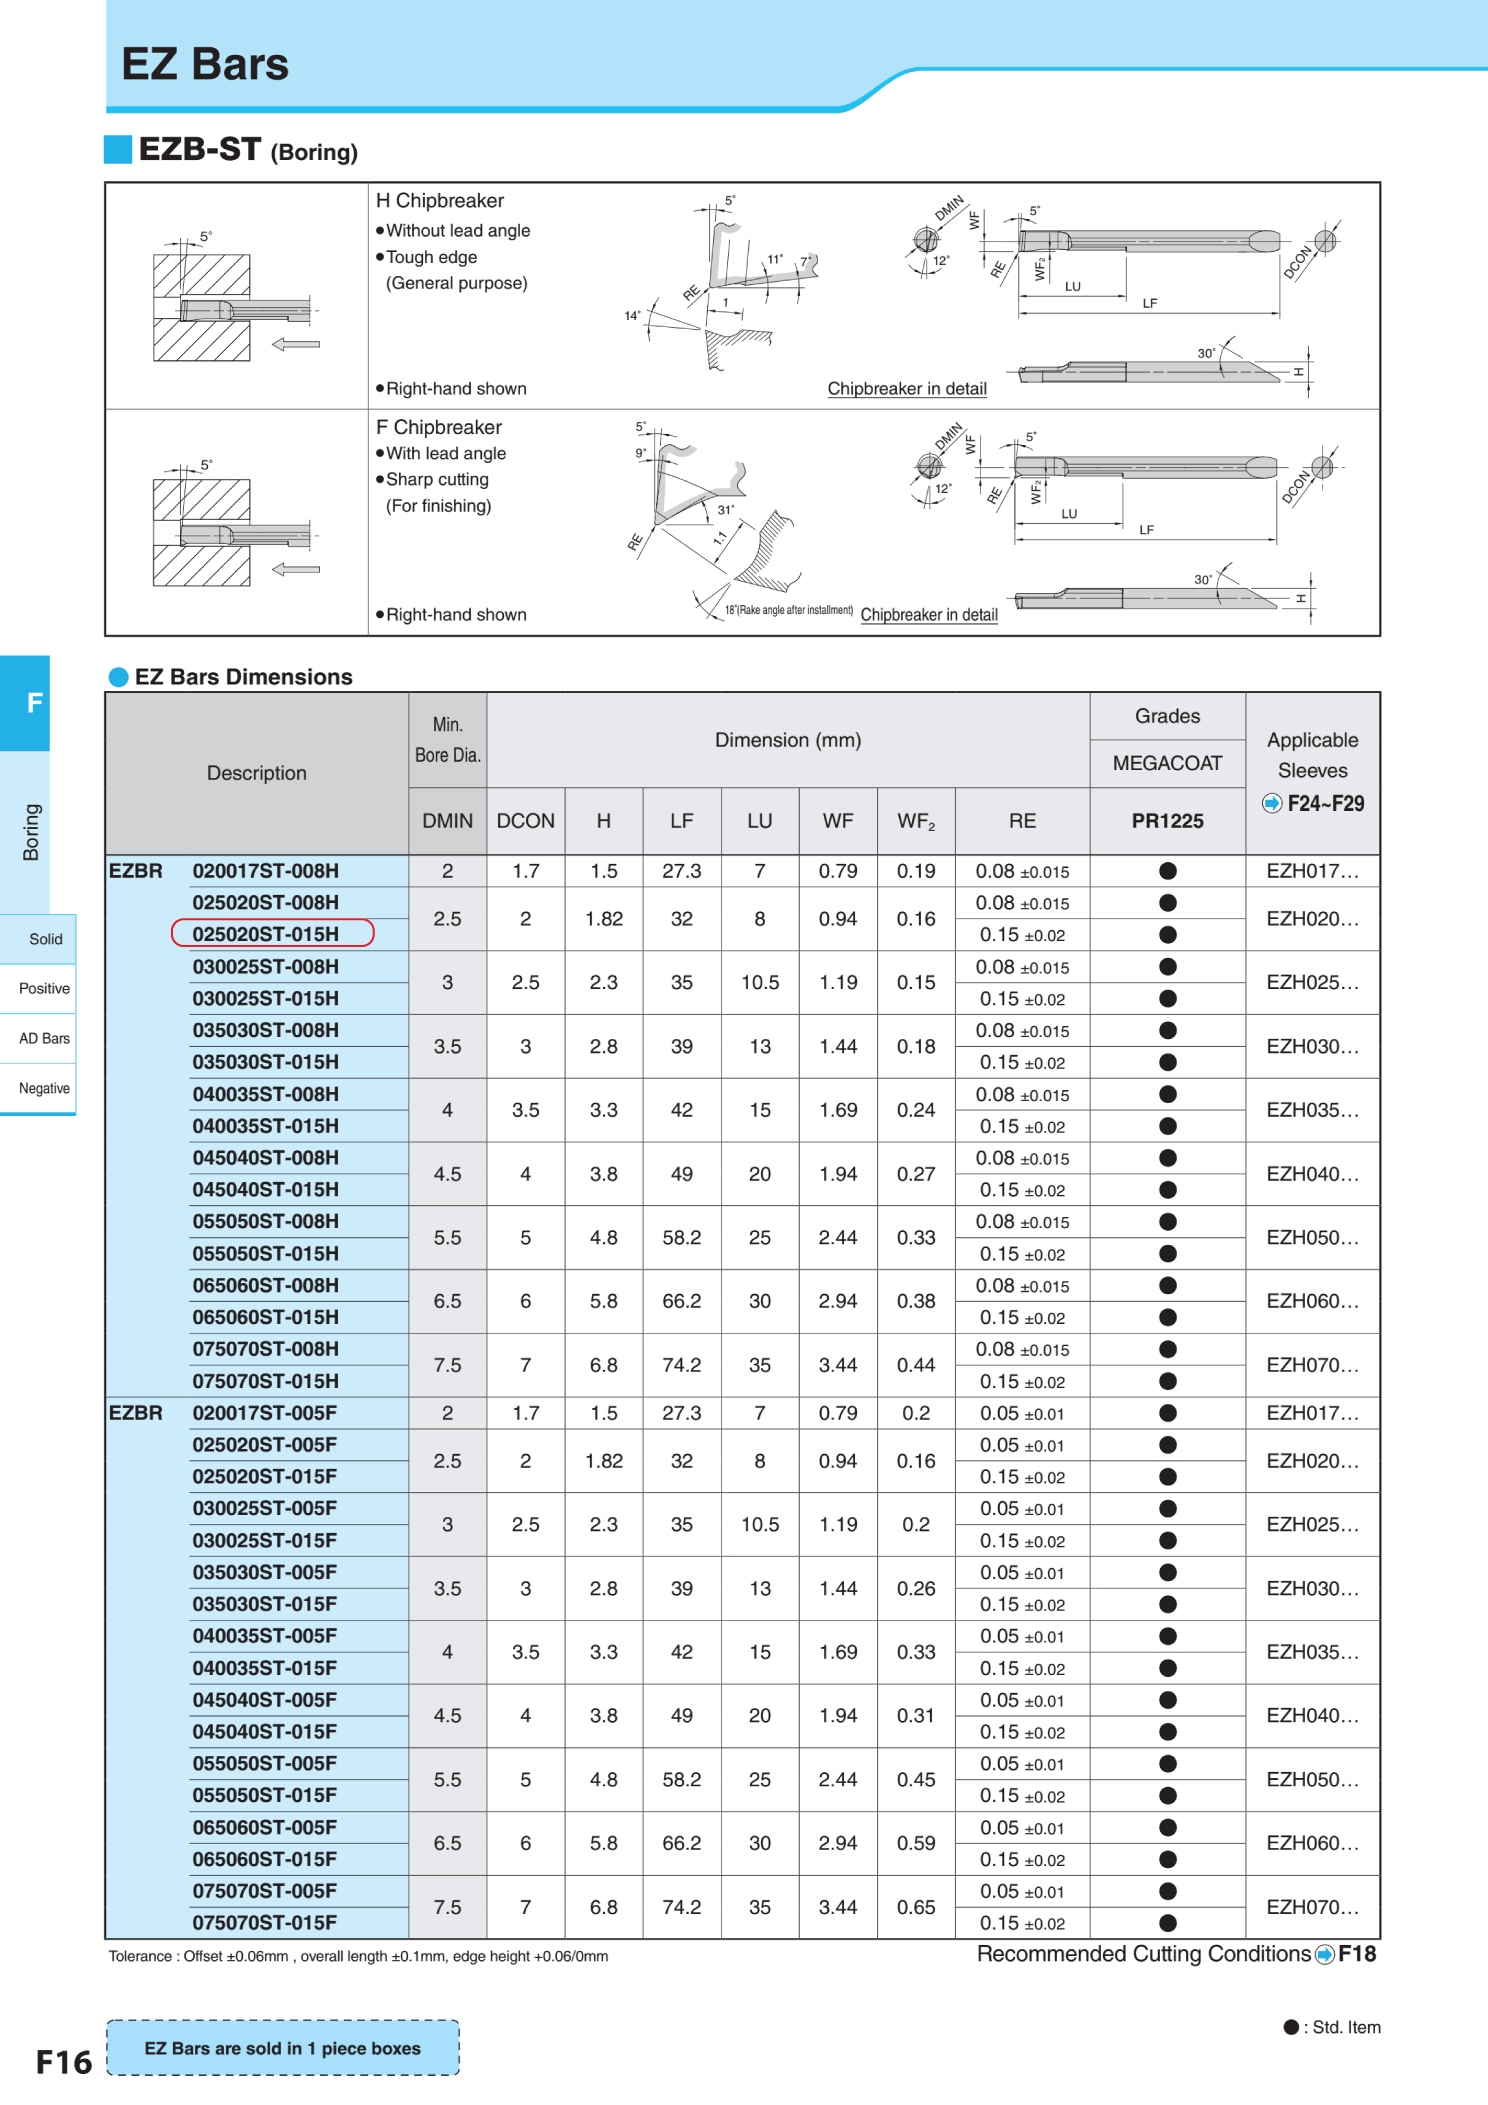 MẢNH DAO TIỆN MÓC LỖ KYOCERA EZBR025020ST-015H (PR1225) 2